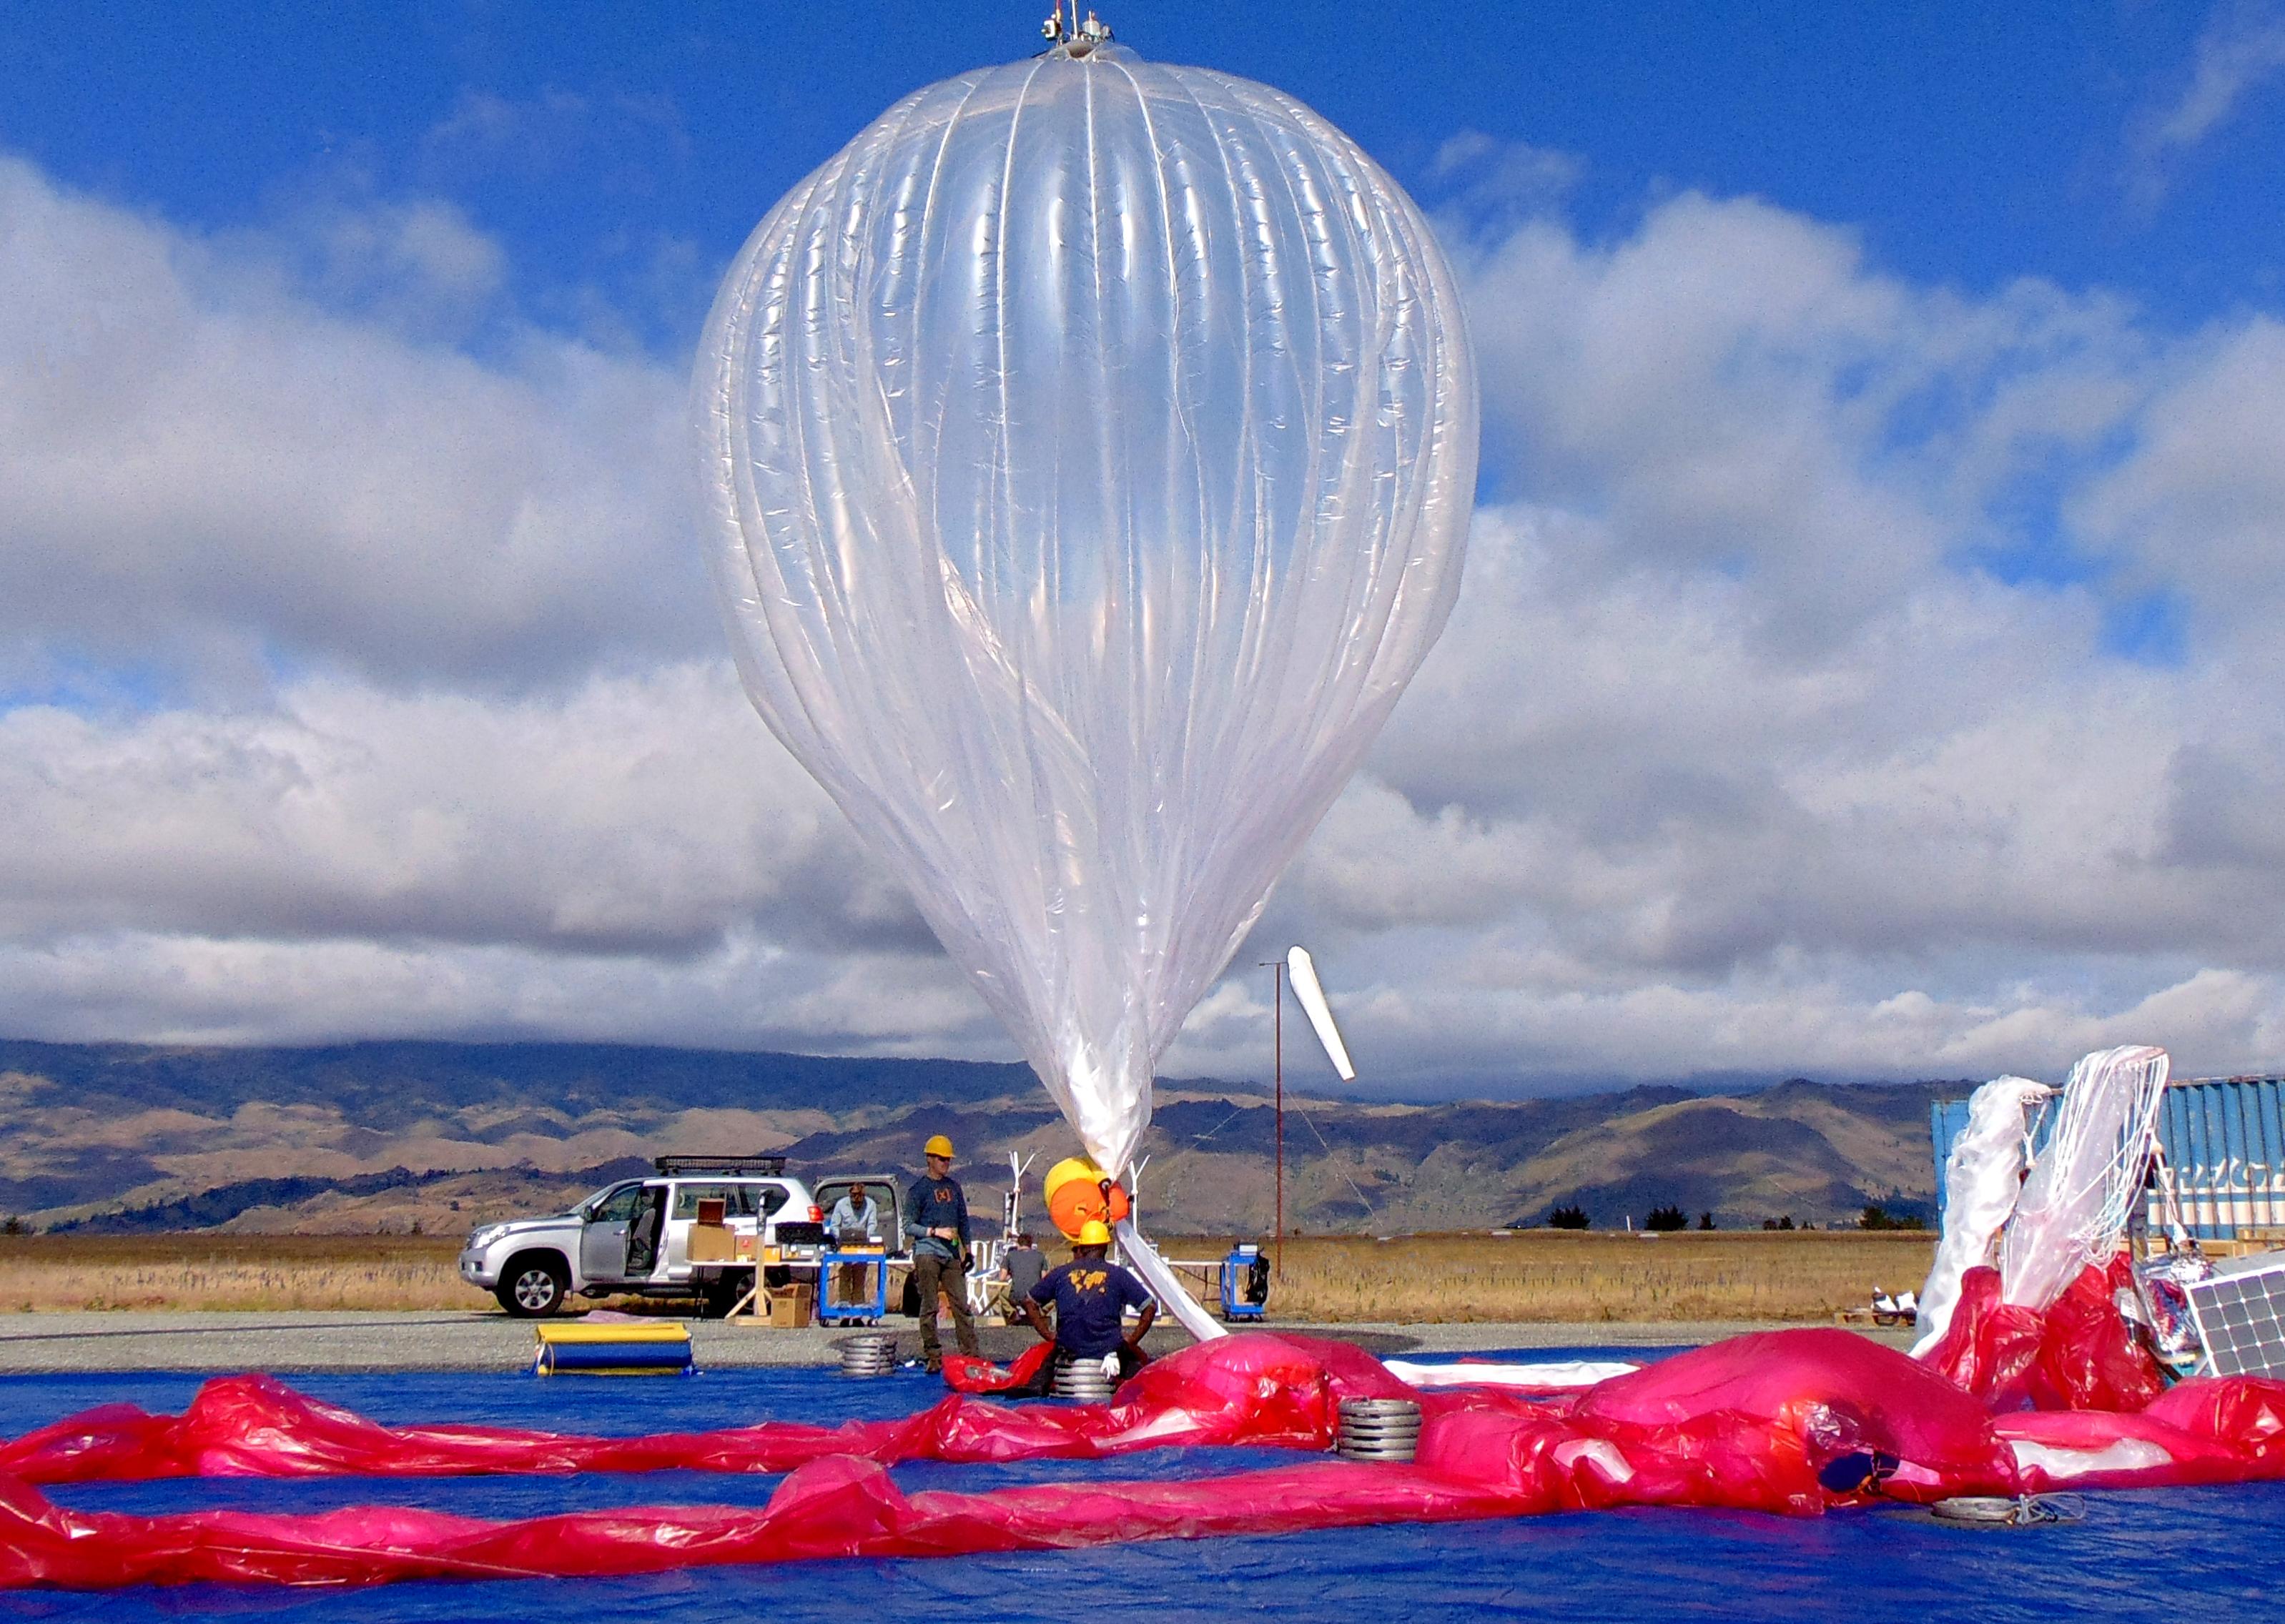 Raven Aerostar Collaborates with Google on Balloon-powered Internet Access